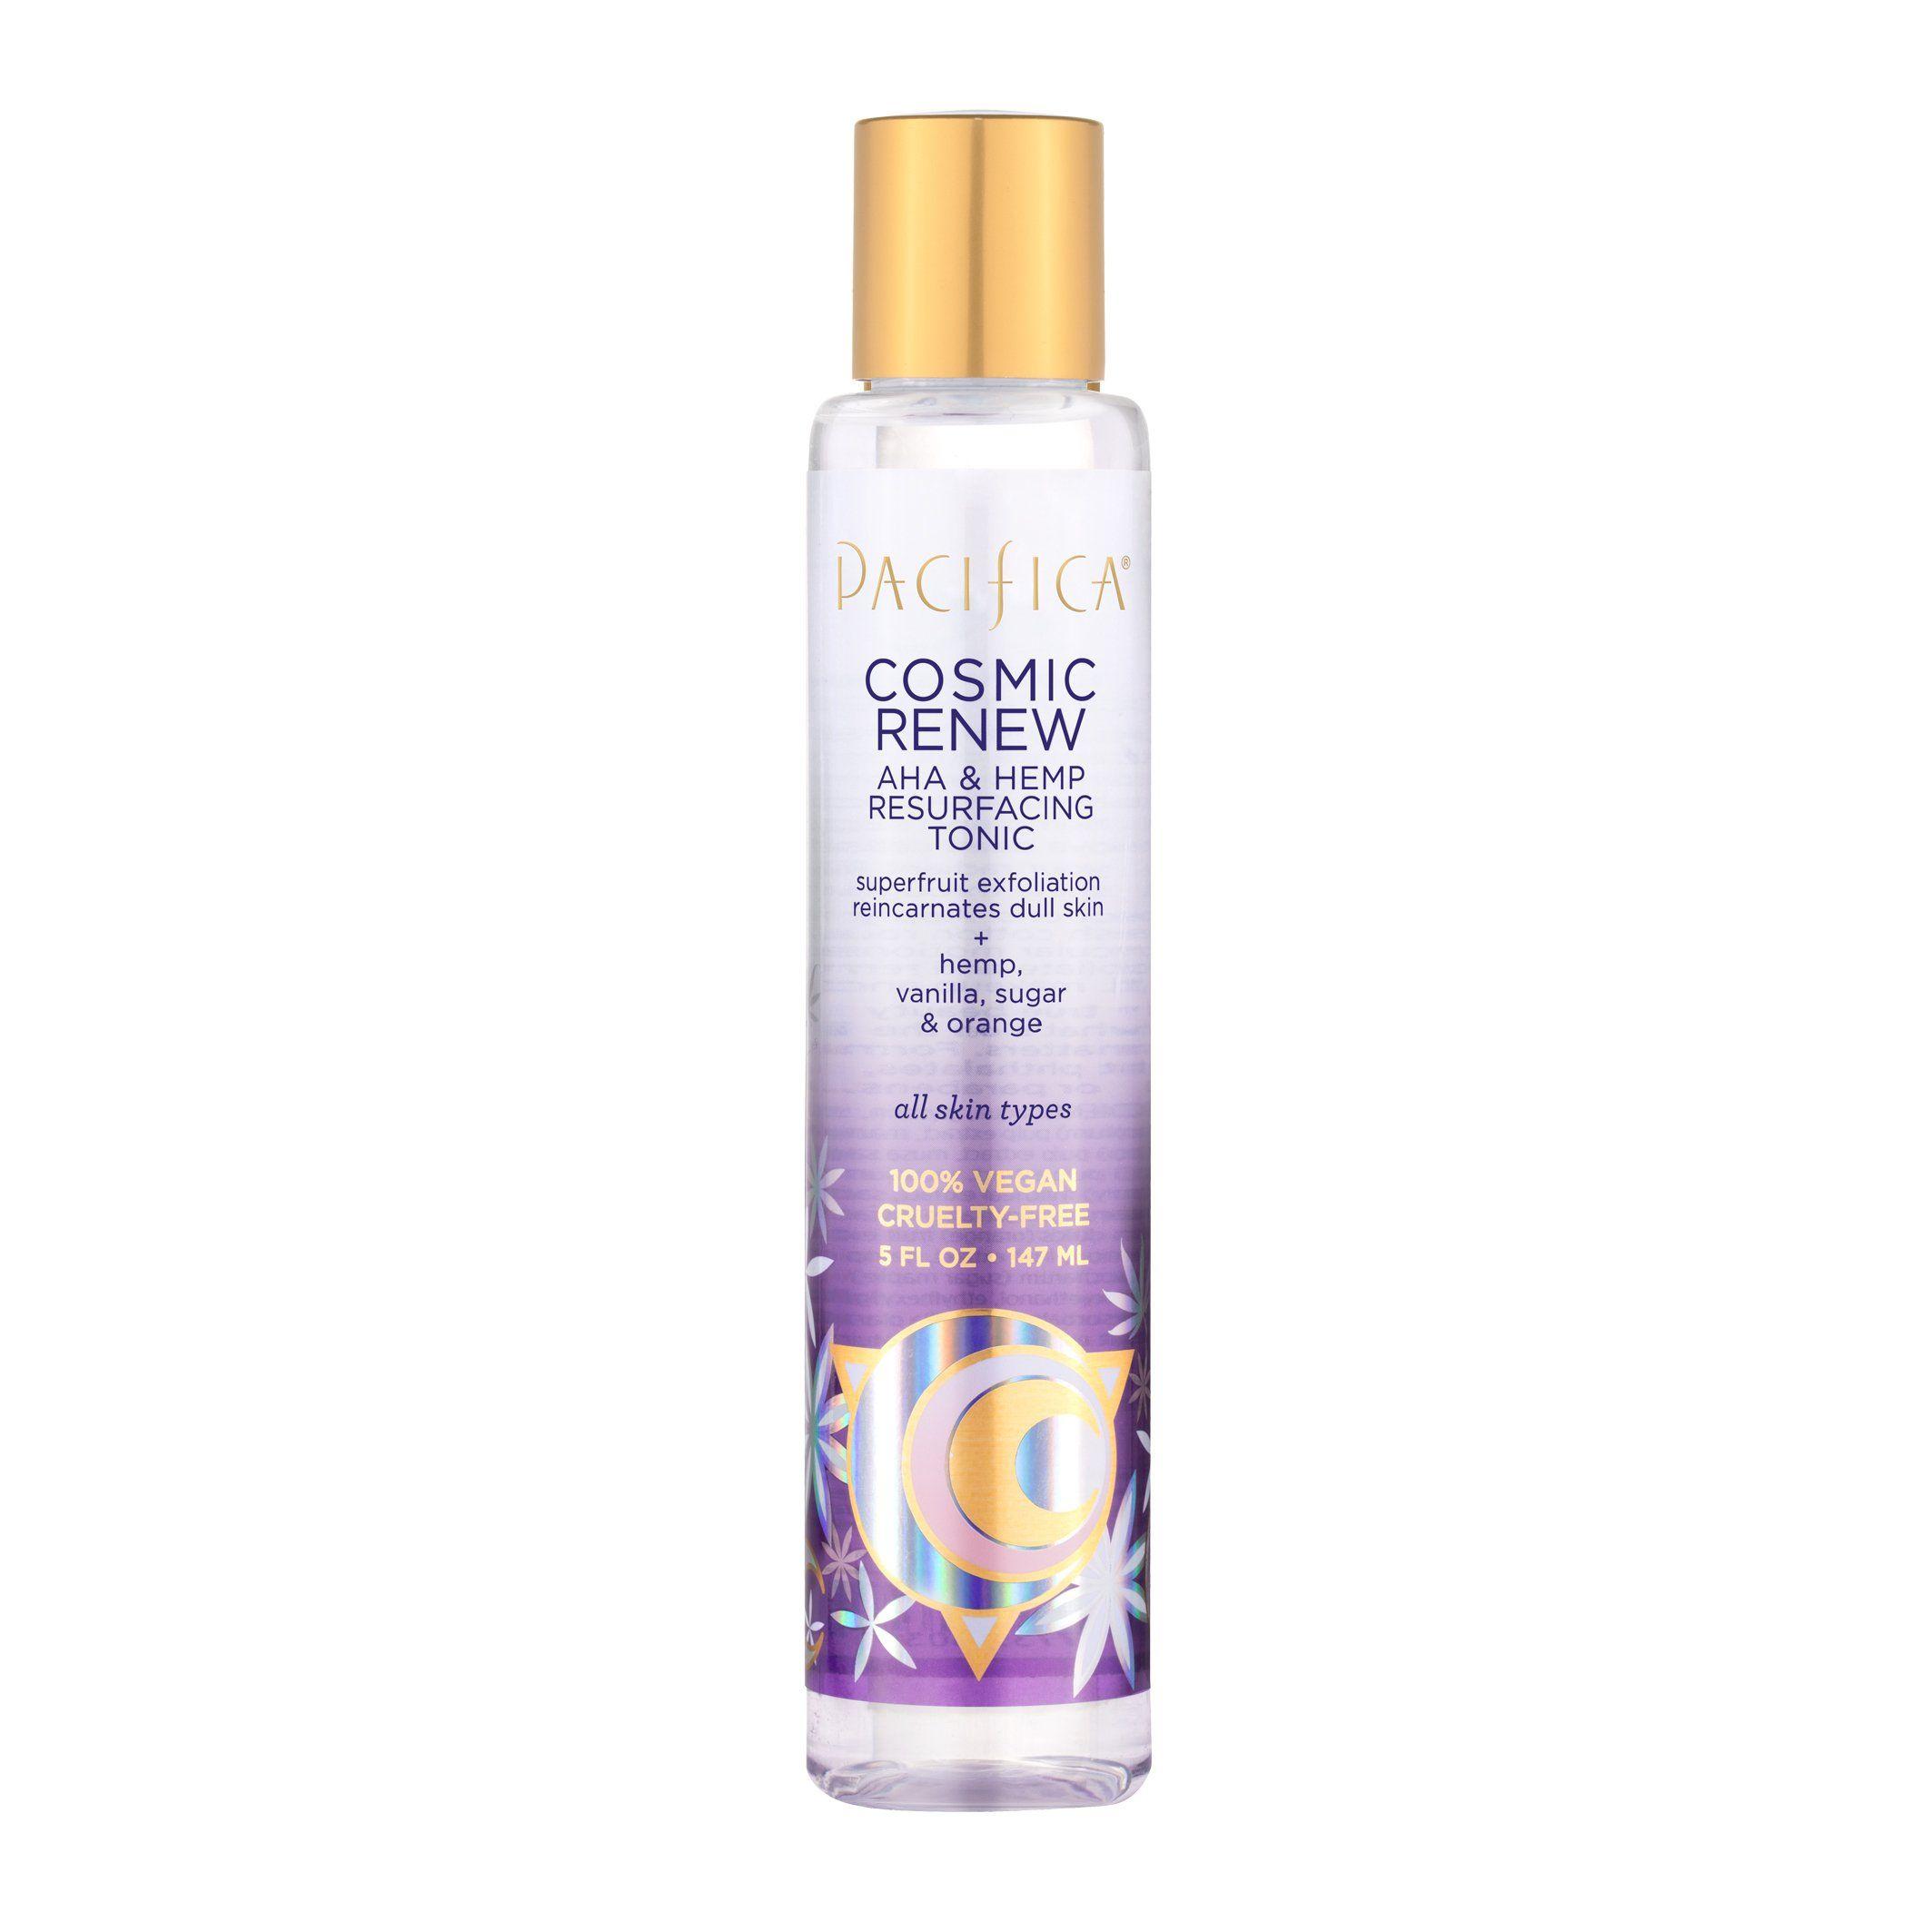 Cosmic Renew Aha Hemp Resurfacing Tonic In 2020 Paraben Free Products Diy Dry Shampoo Hemp